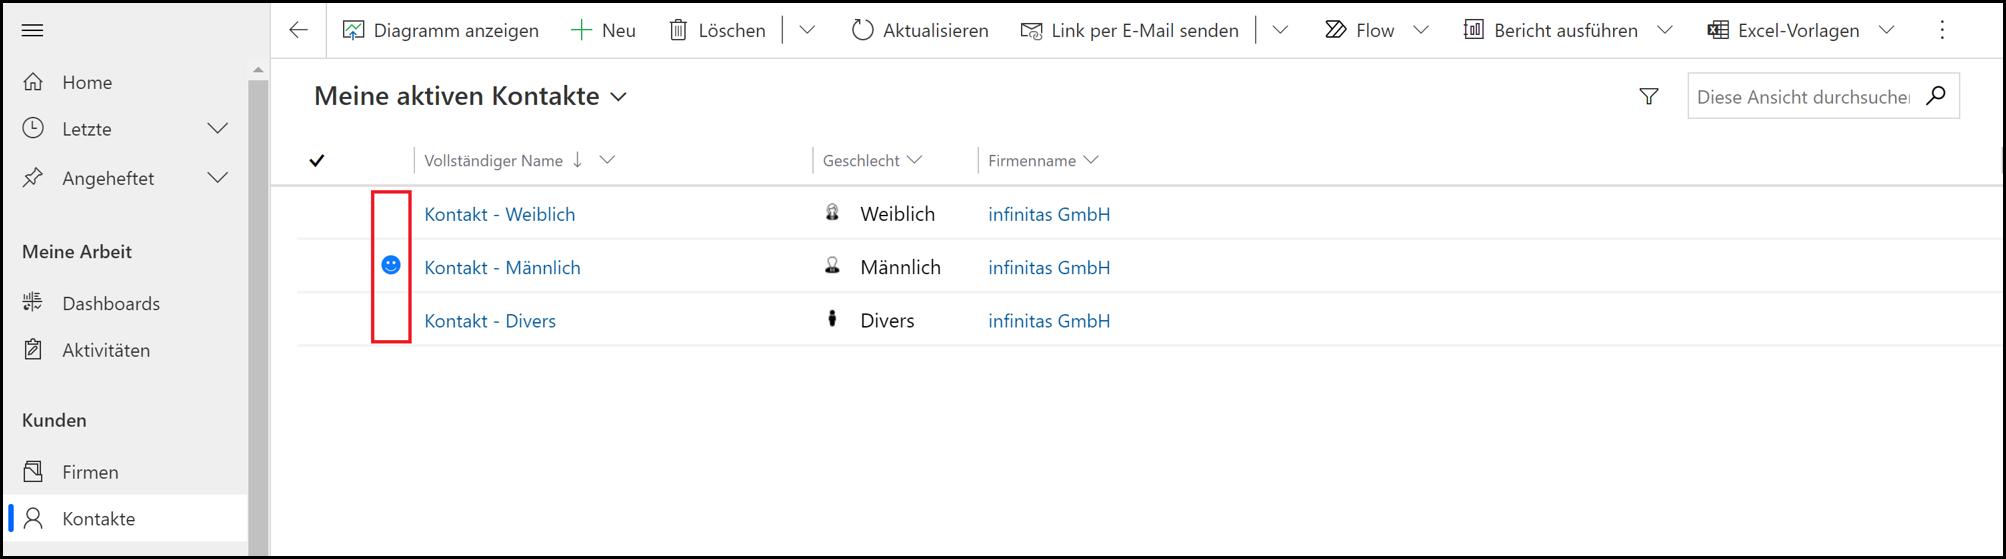 Microsoft_Dynamics _365_Grafiken_in_Ansichtsspalten_hinzufuegen_Abb10